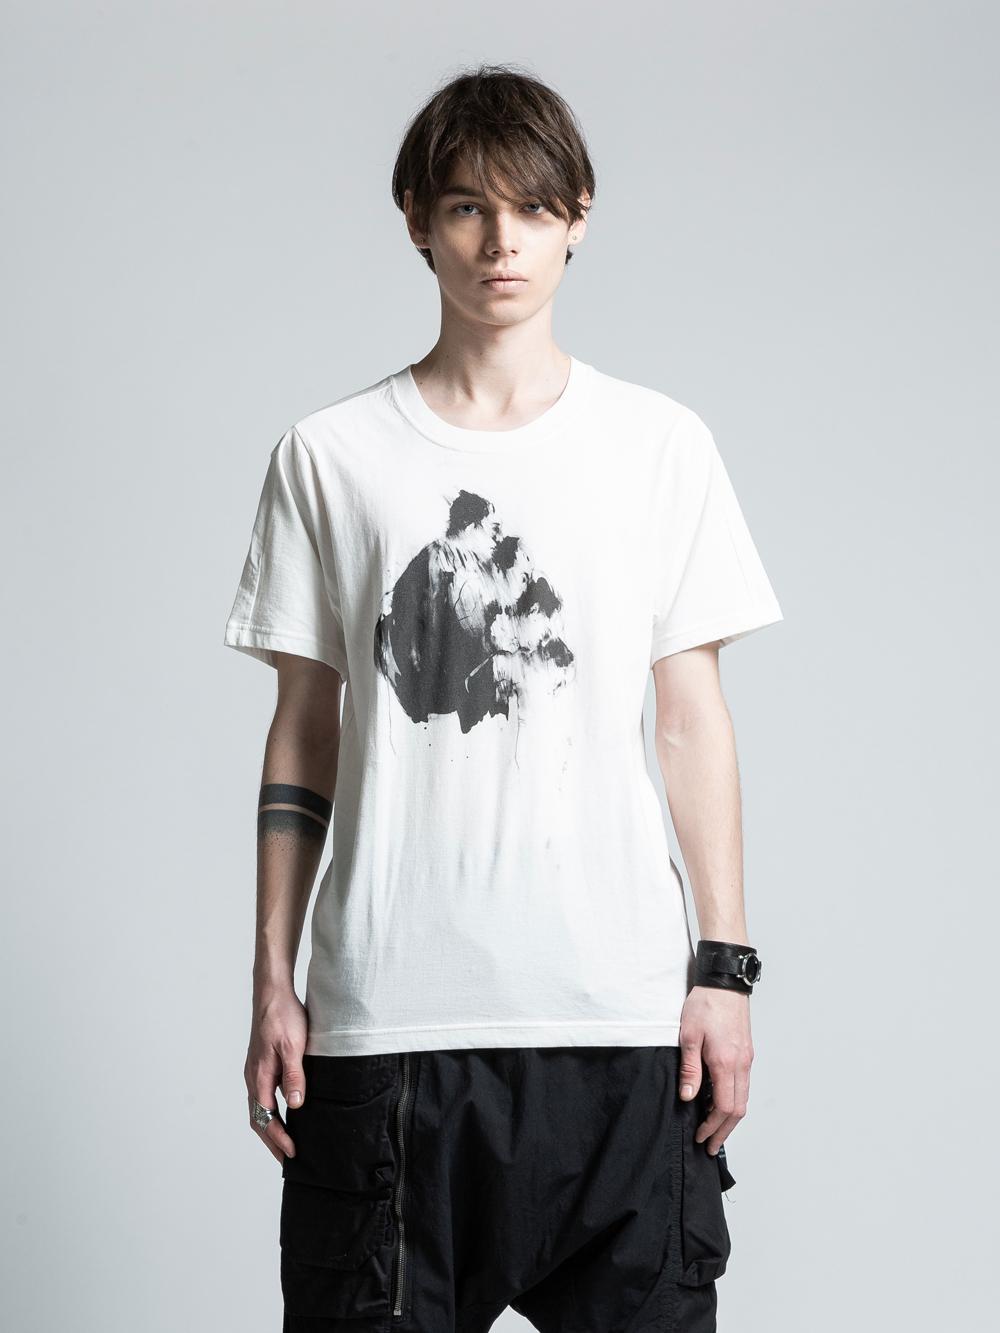 VI-PM-002-01 / PATRICIA MARCH コラボレーションフロントプリントTシャツ